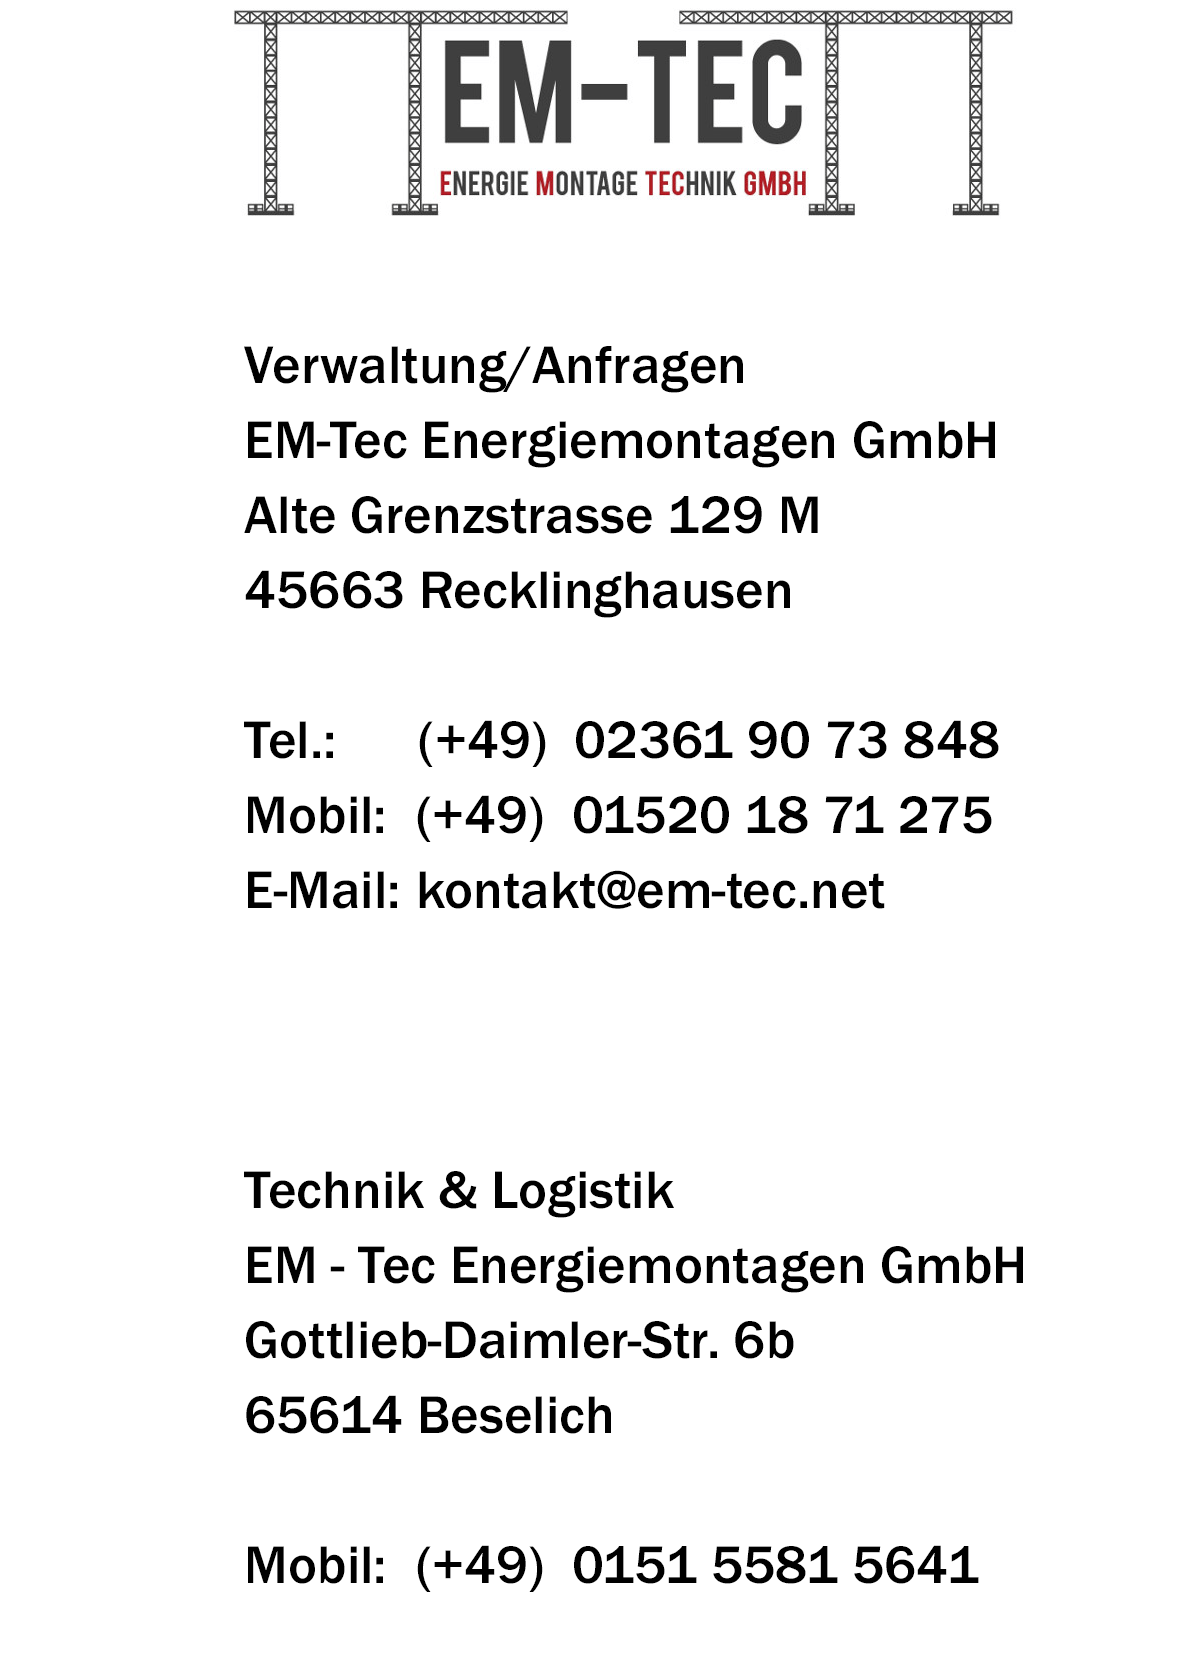 Kontakt Bodo Hanspach